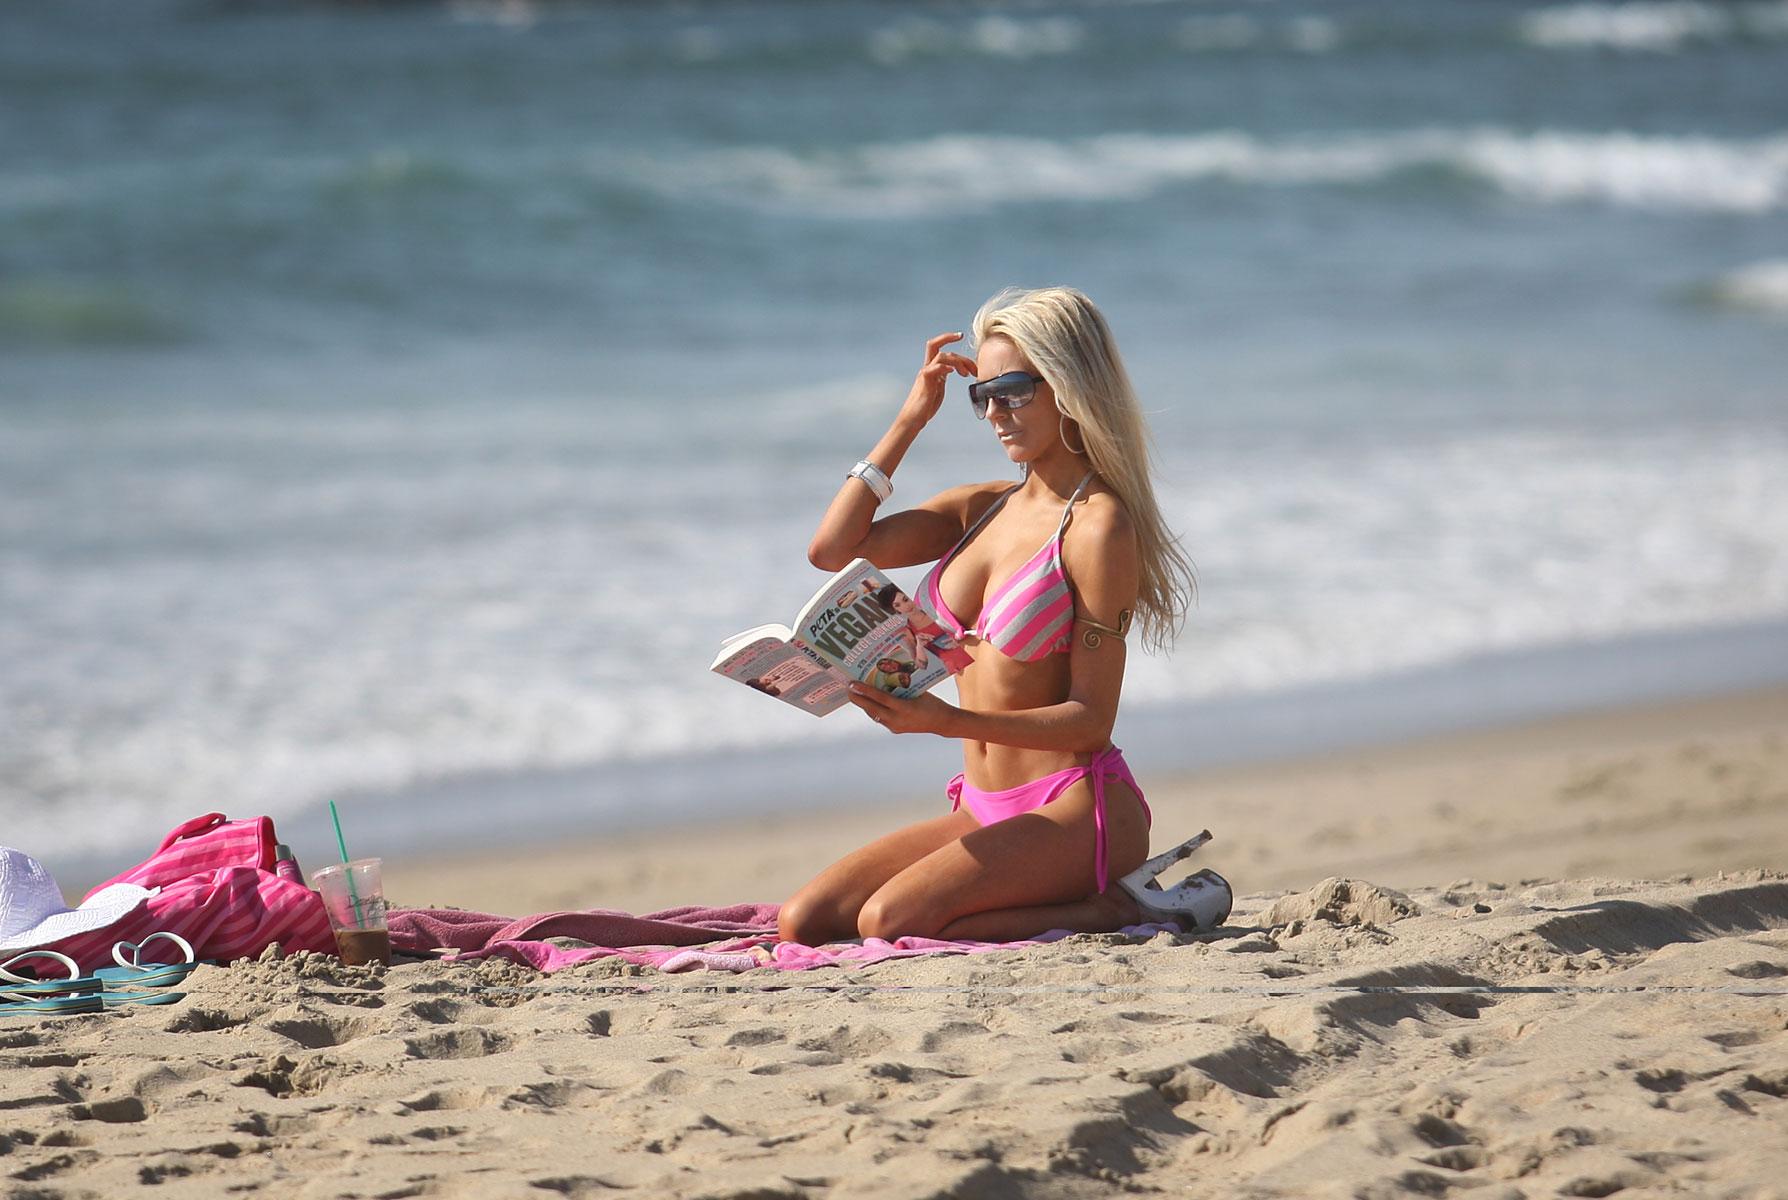 Courtney Stodden in Bikini on the beach in Malibu Pic 22 of 35